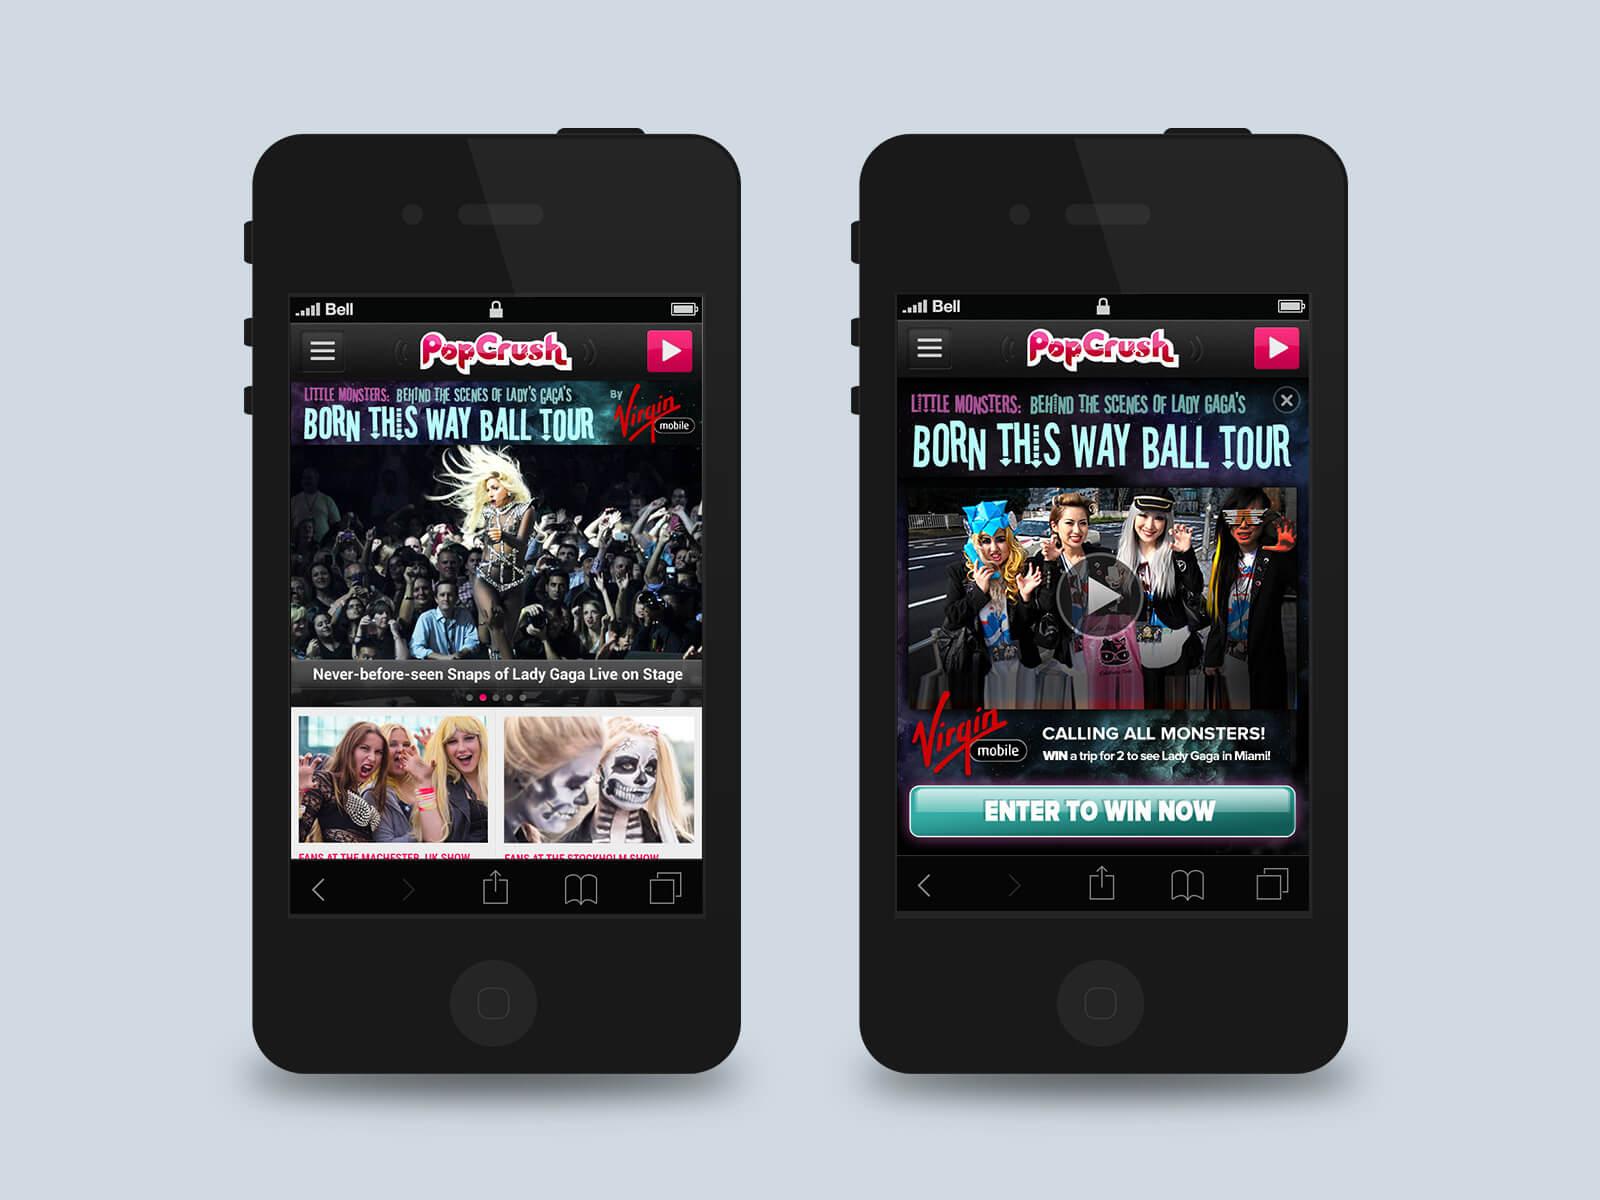 Townsquare Media - Popcrush mobile ads